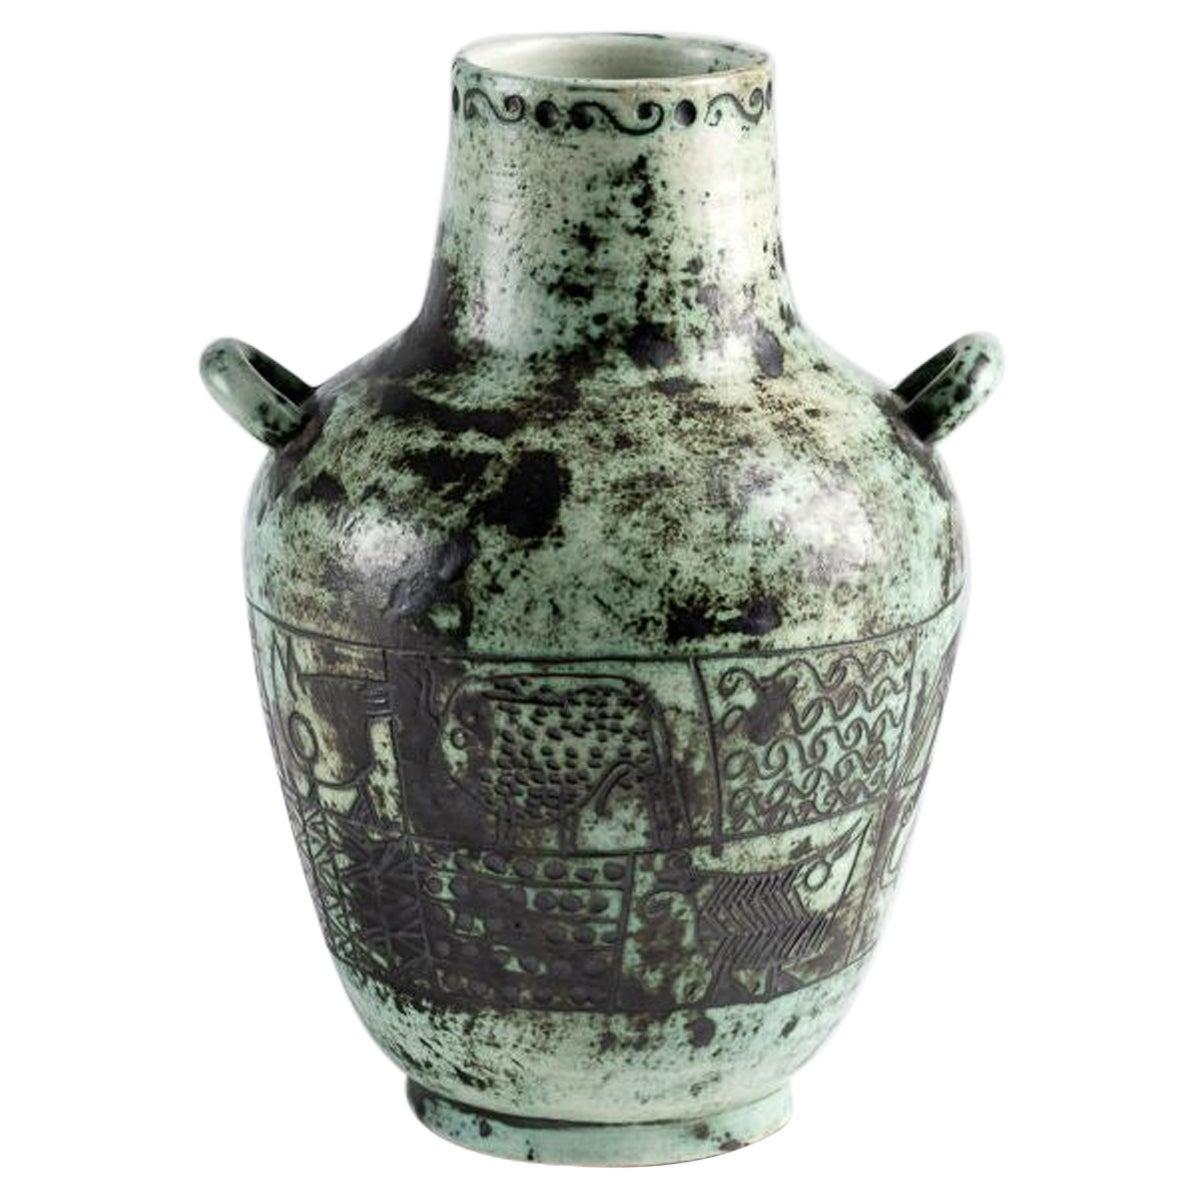 Jacques Blin, Blue Double Handled Ceramic Vase, France, circa 1940s